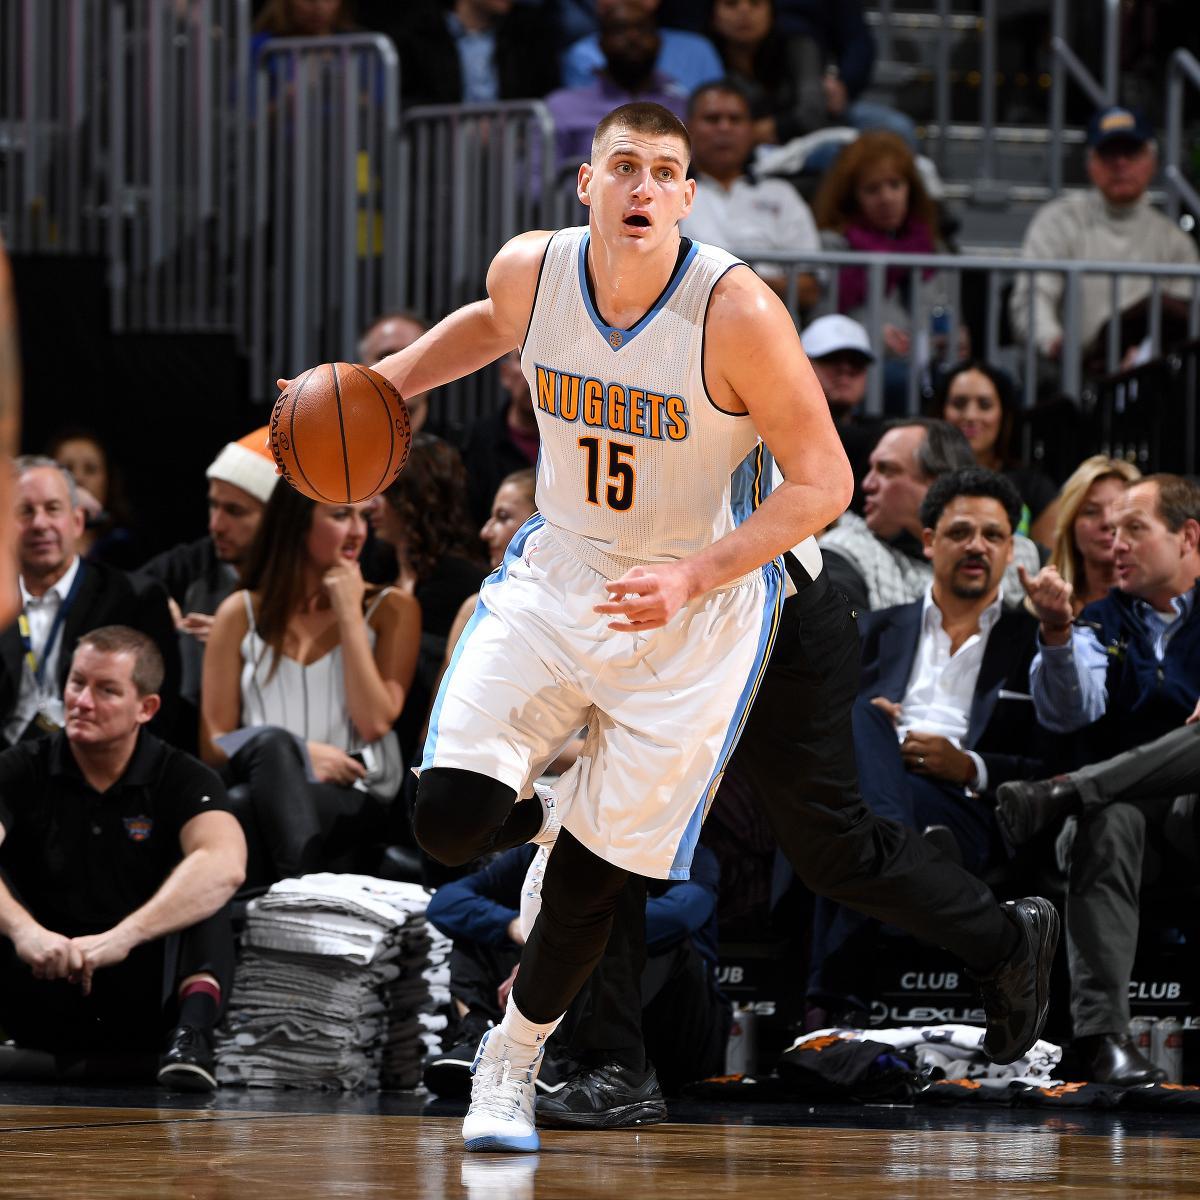 Nuggets Injury Report: Nikola Jokic Injury: Updates On Nuggets Star's Hip And